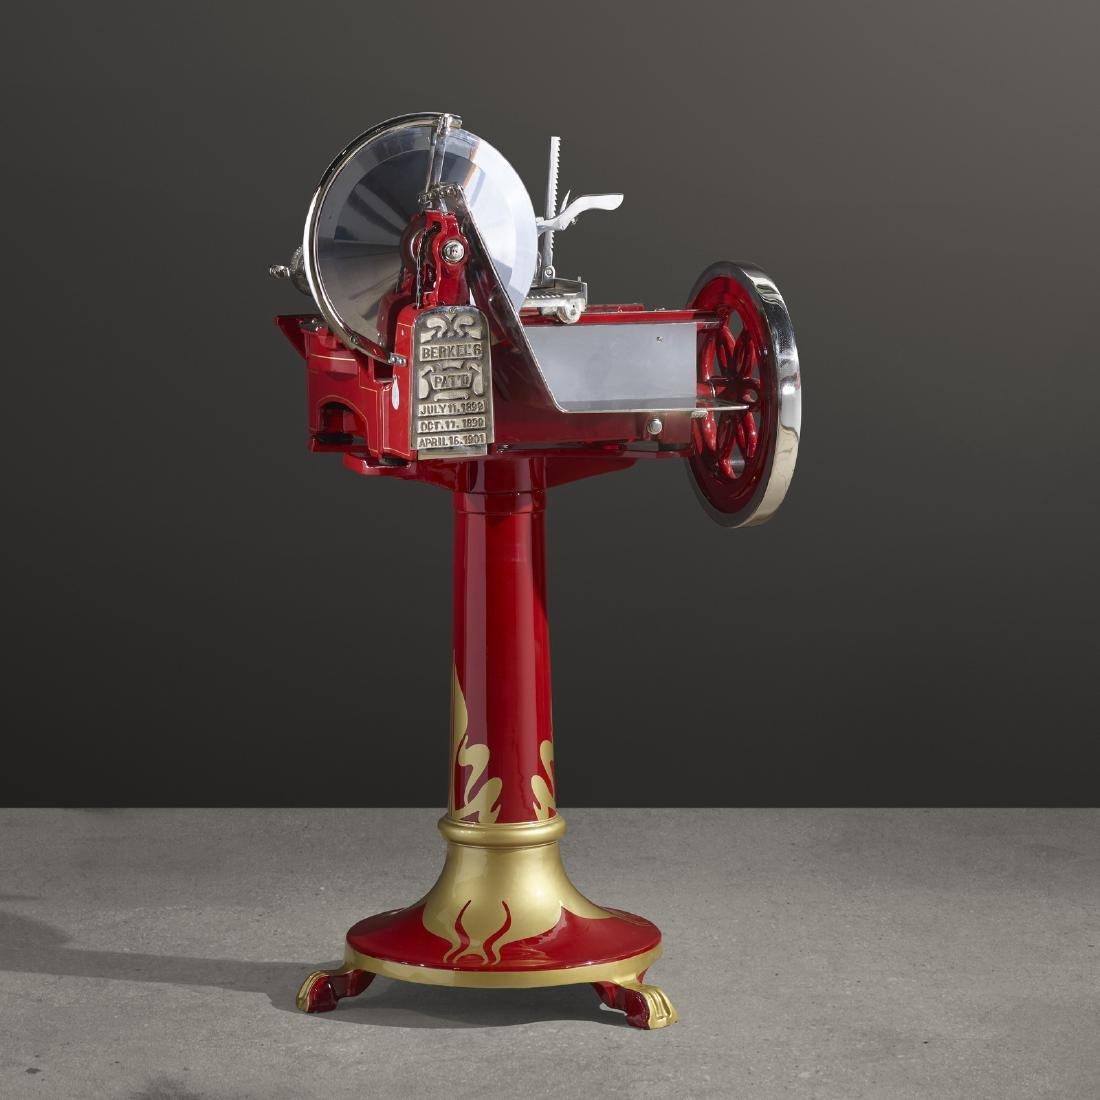 Berkel, Flywheel slicer, model C